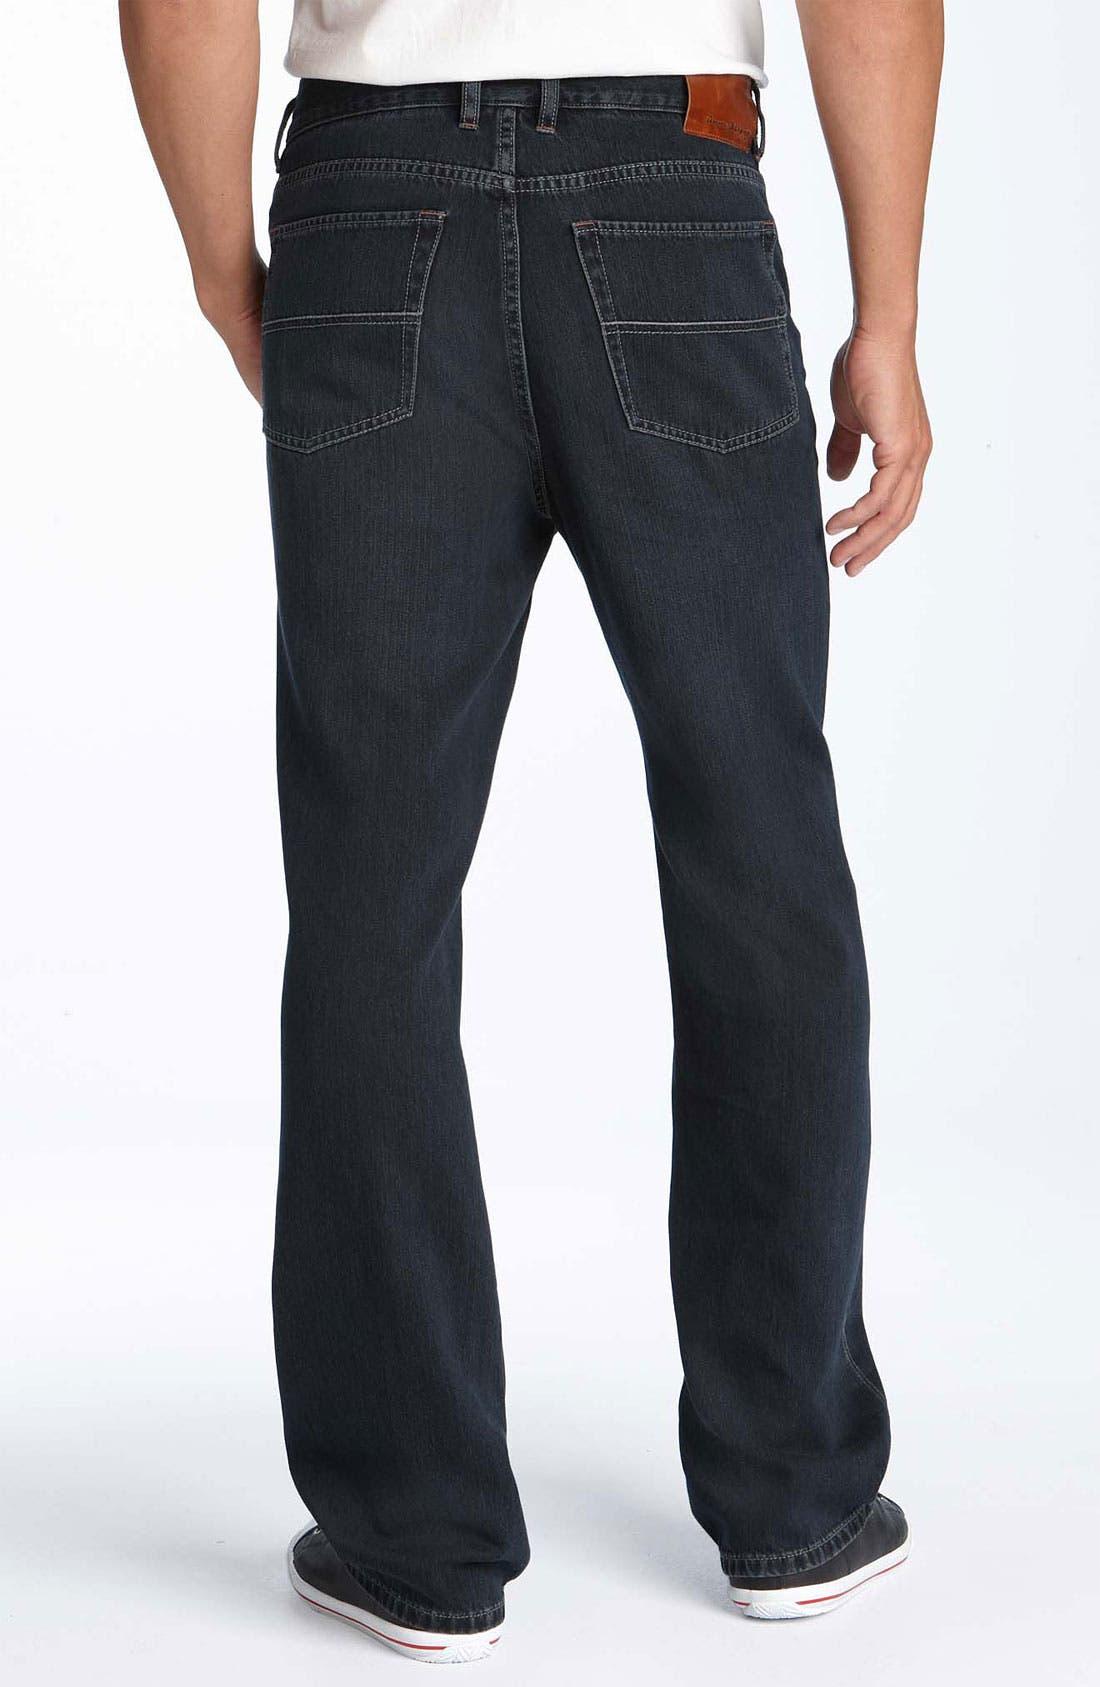 Alternate Image 2  - Tommy Bahama Denim 'Island Ease' Straight Leg Jeans (Black Overdye)